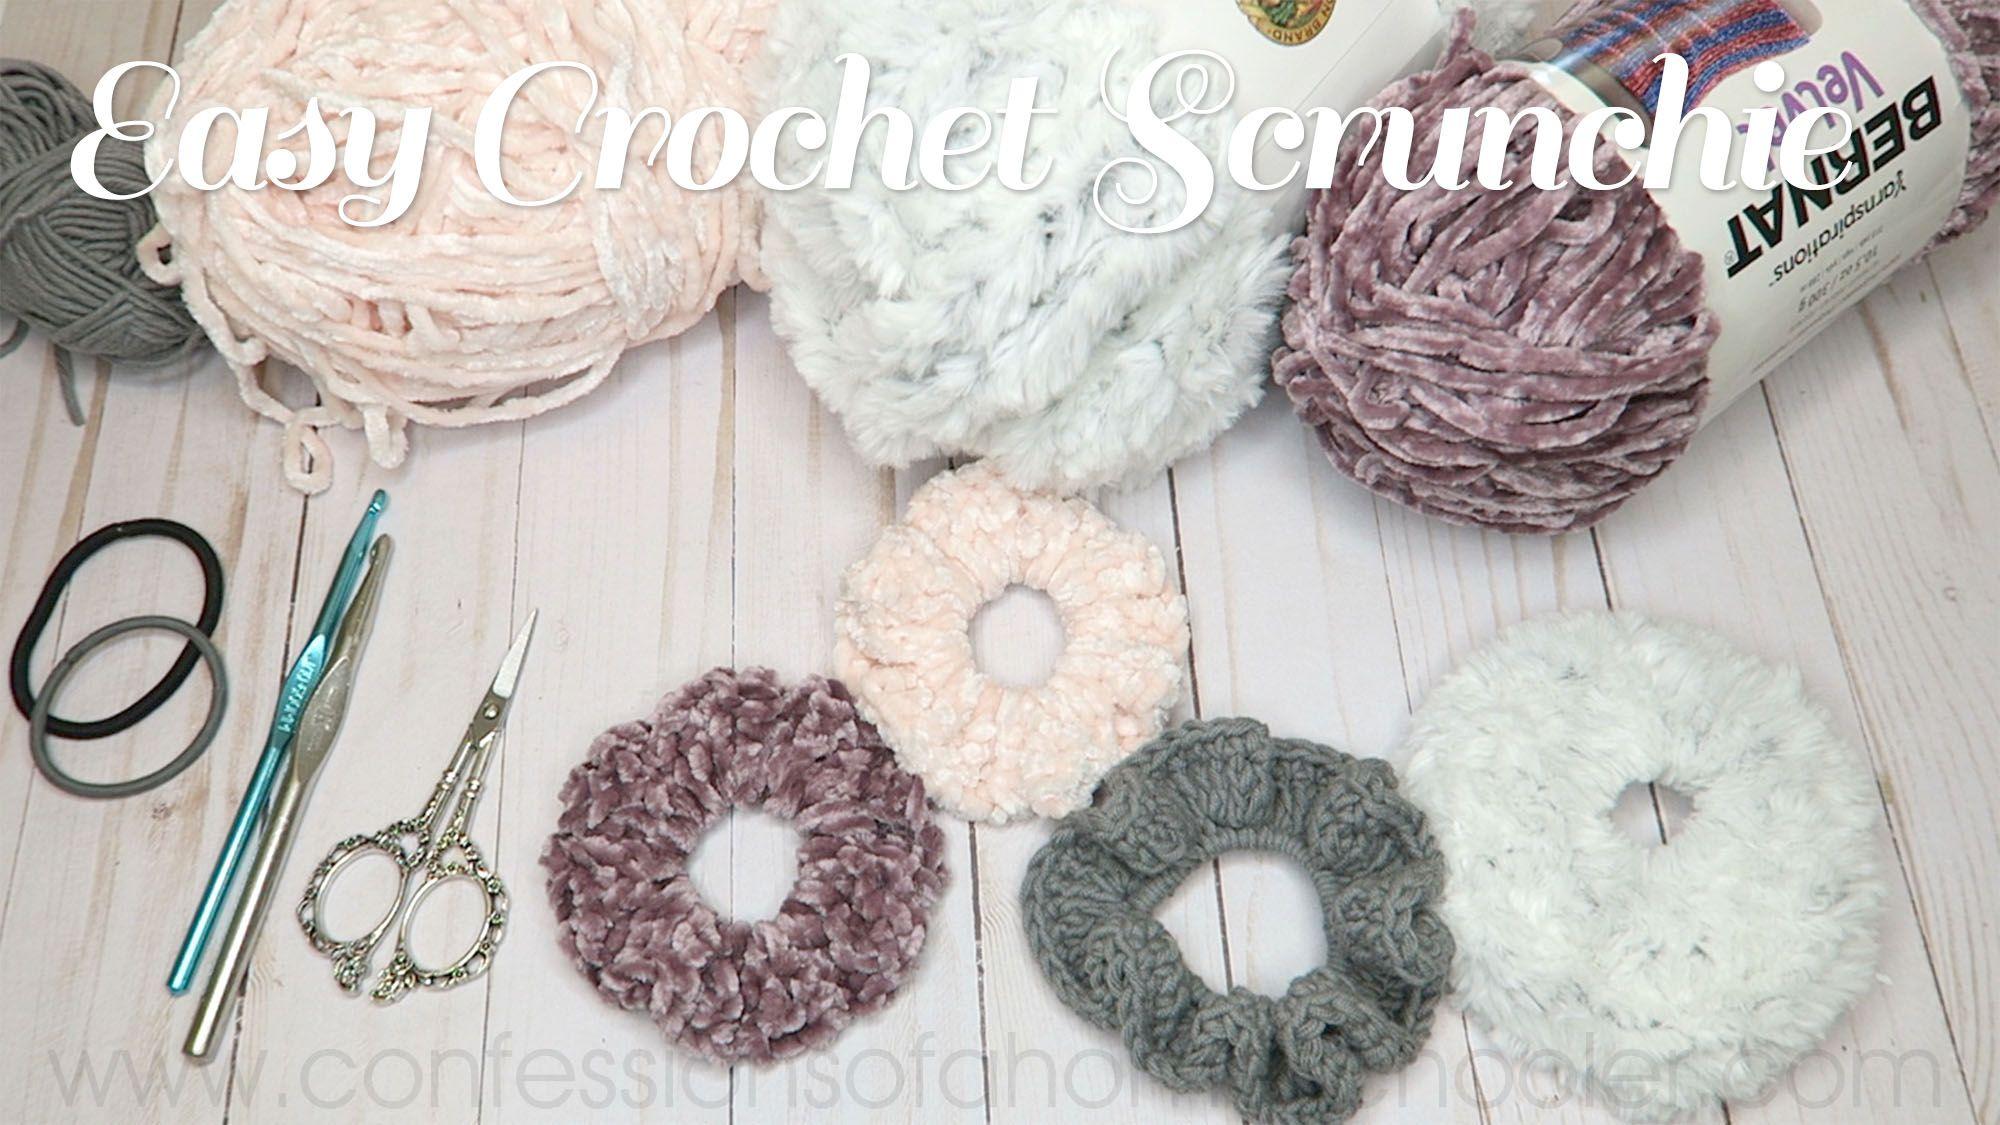 Easy Crochet Scrunchie Tutorial